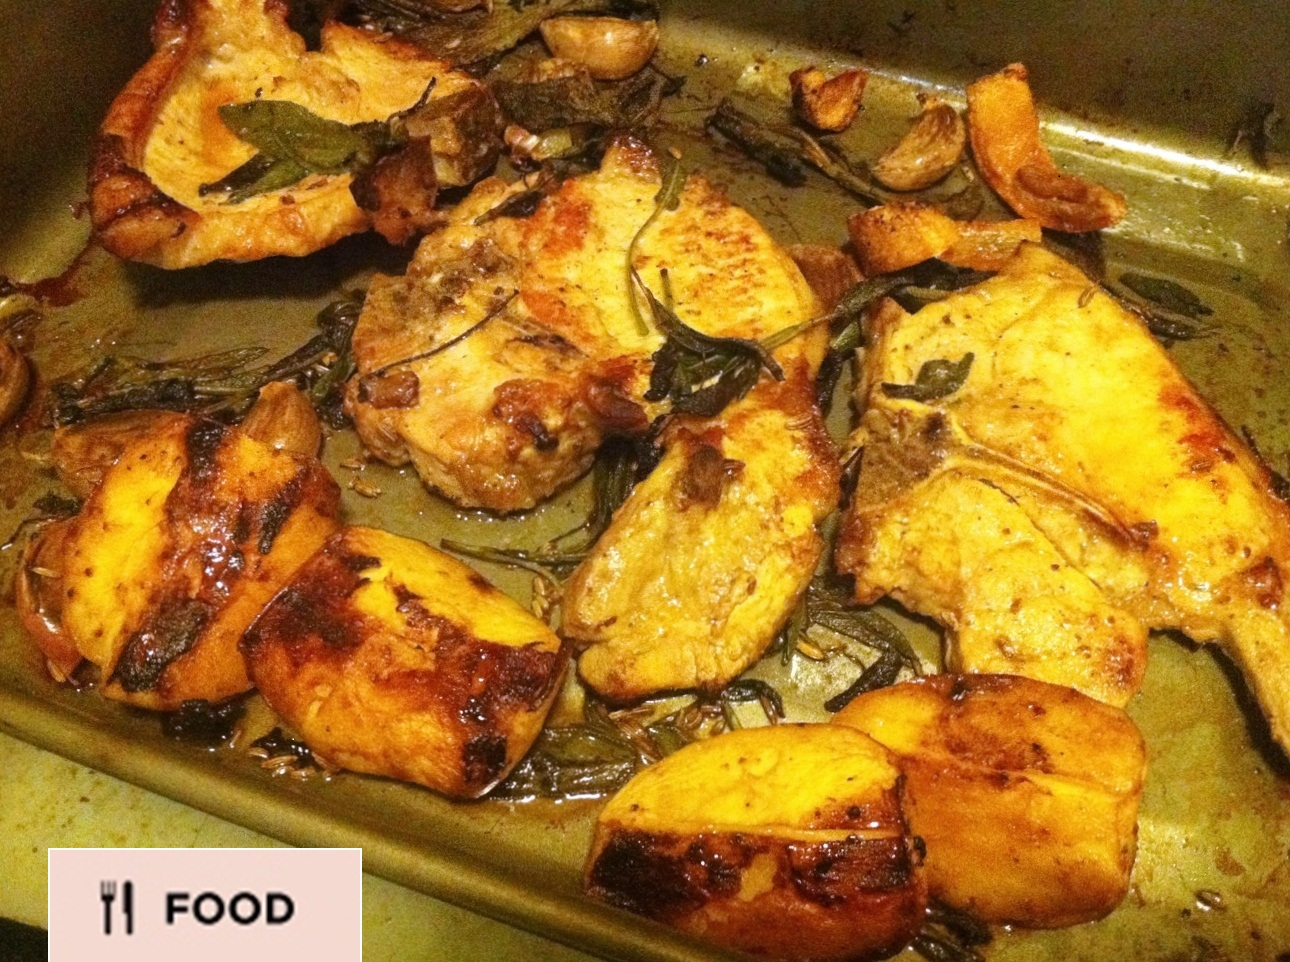 Jamie Oliver's Pork Chops With Sage, Crispy Crackling And Crushed Potatoes